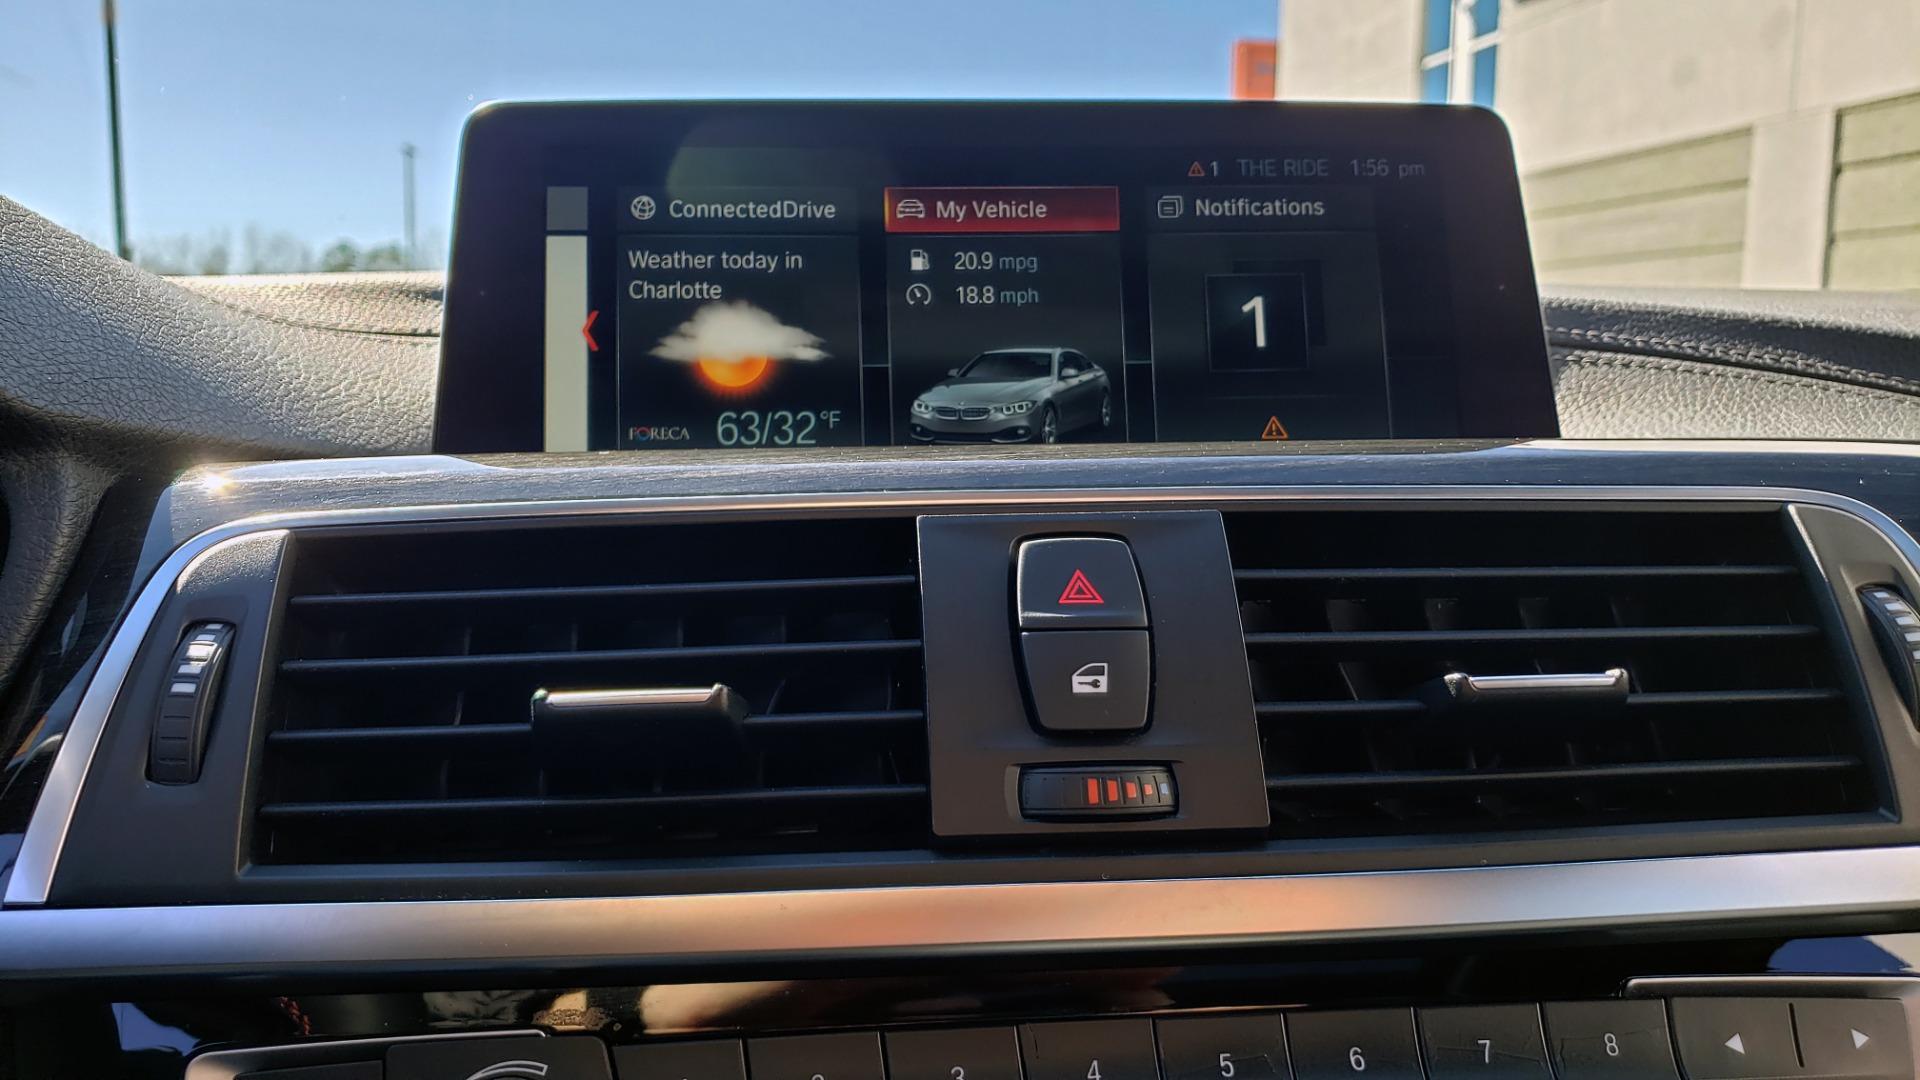 Used 2018 BMW 4 SERIES 430IXDRIVE / PREMIUM / NAV / SUNROOF / ESSENTIALS PKG for sale $28,995 at Formula Imports in Charlotte NC 28227 47